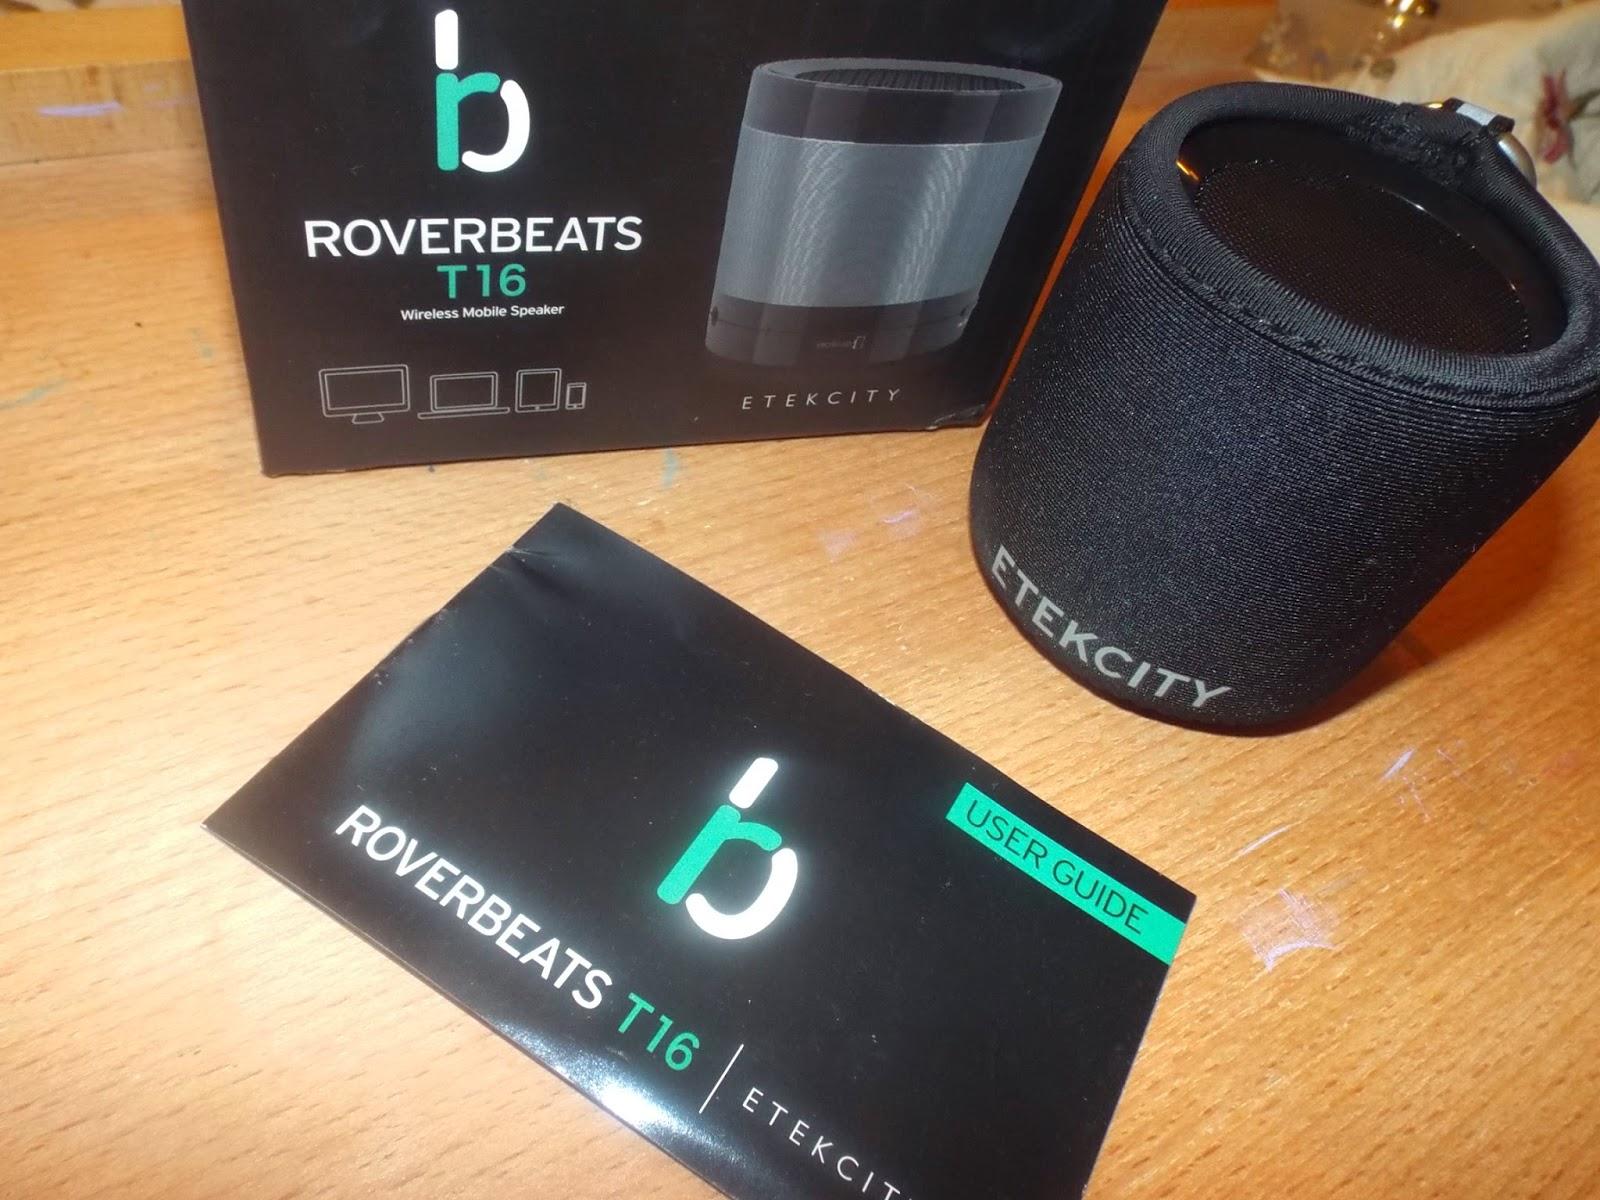 EtekCity Roverbeats speaker